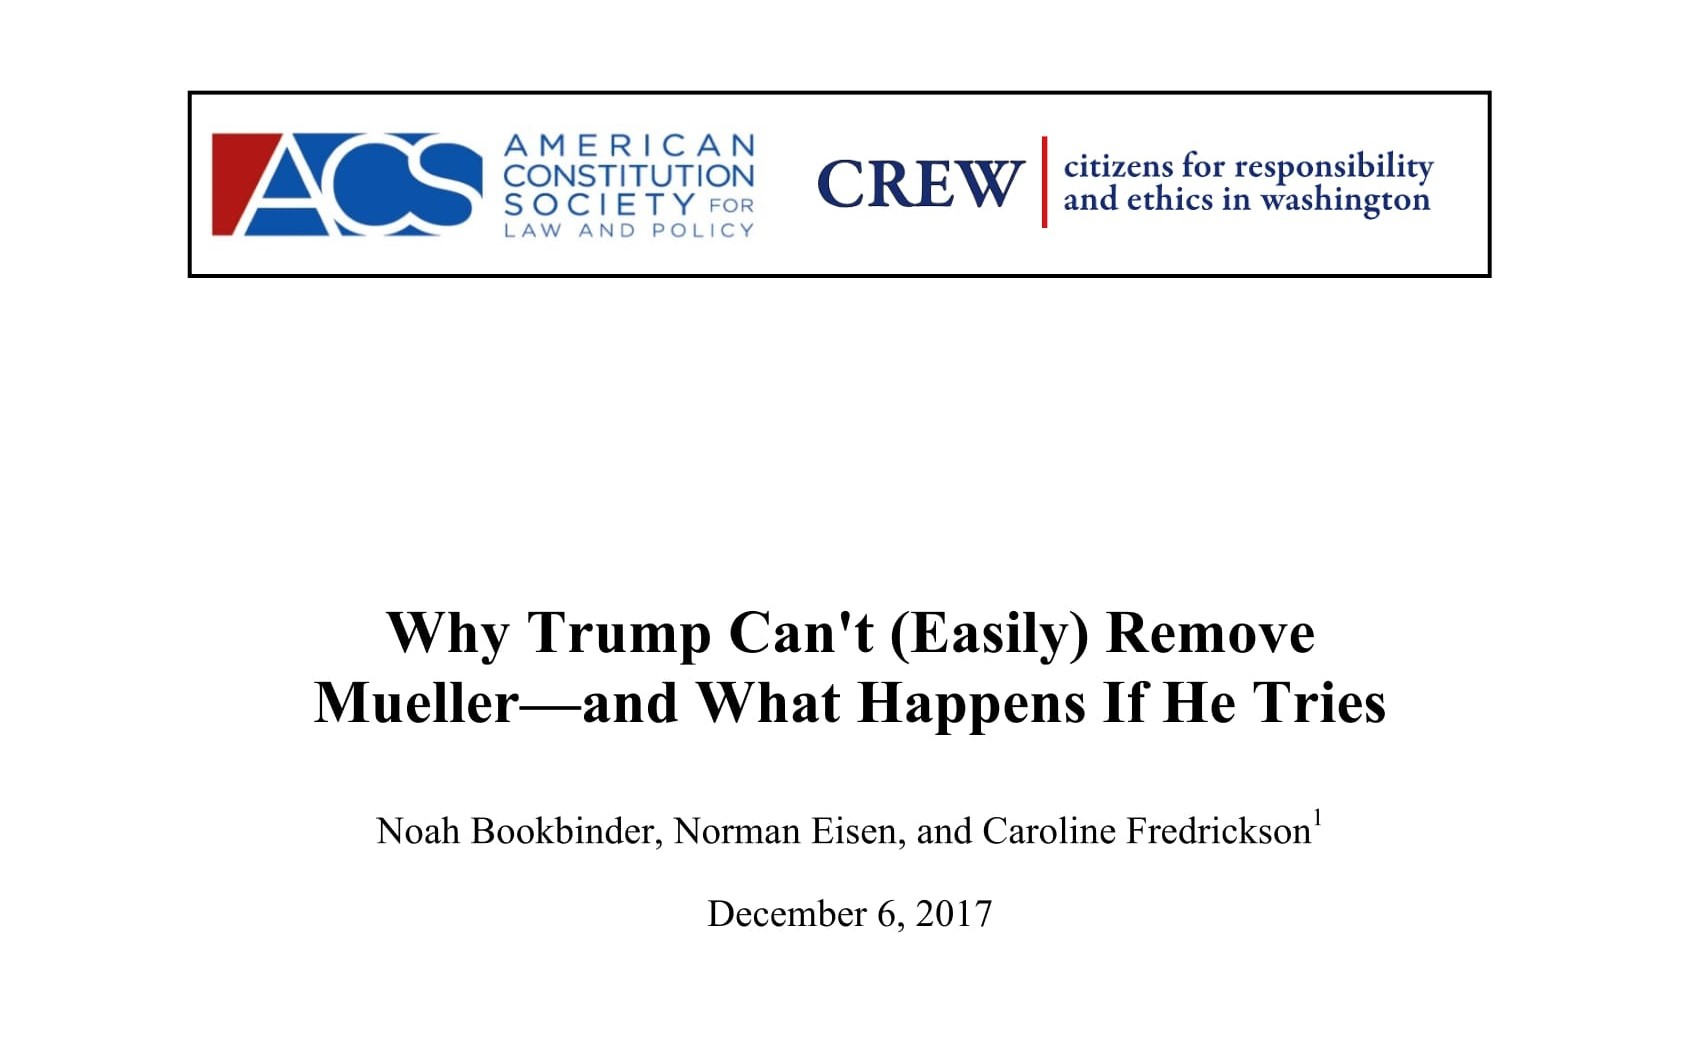 ACS_CREW_PIE_Project_Why_Trump.jpg